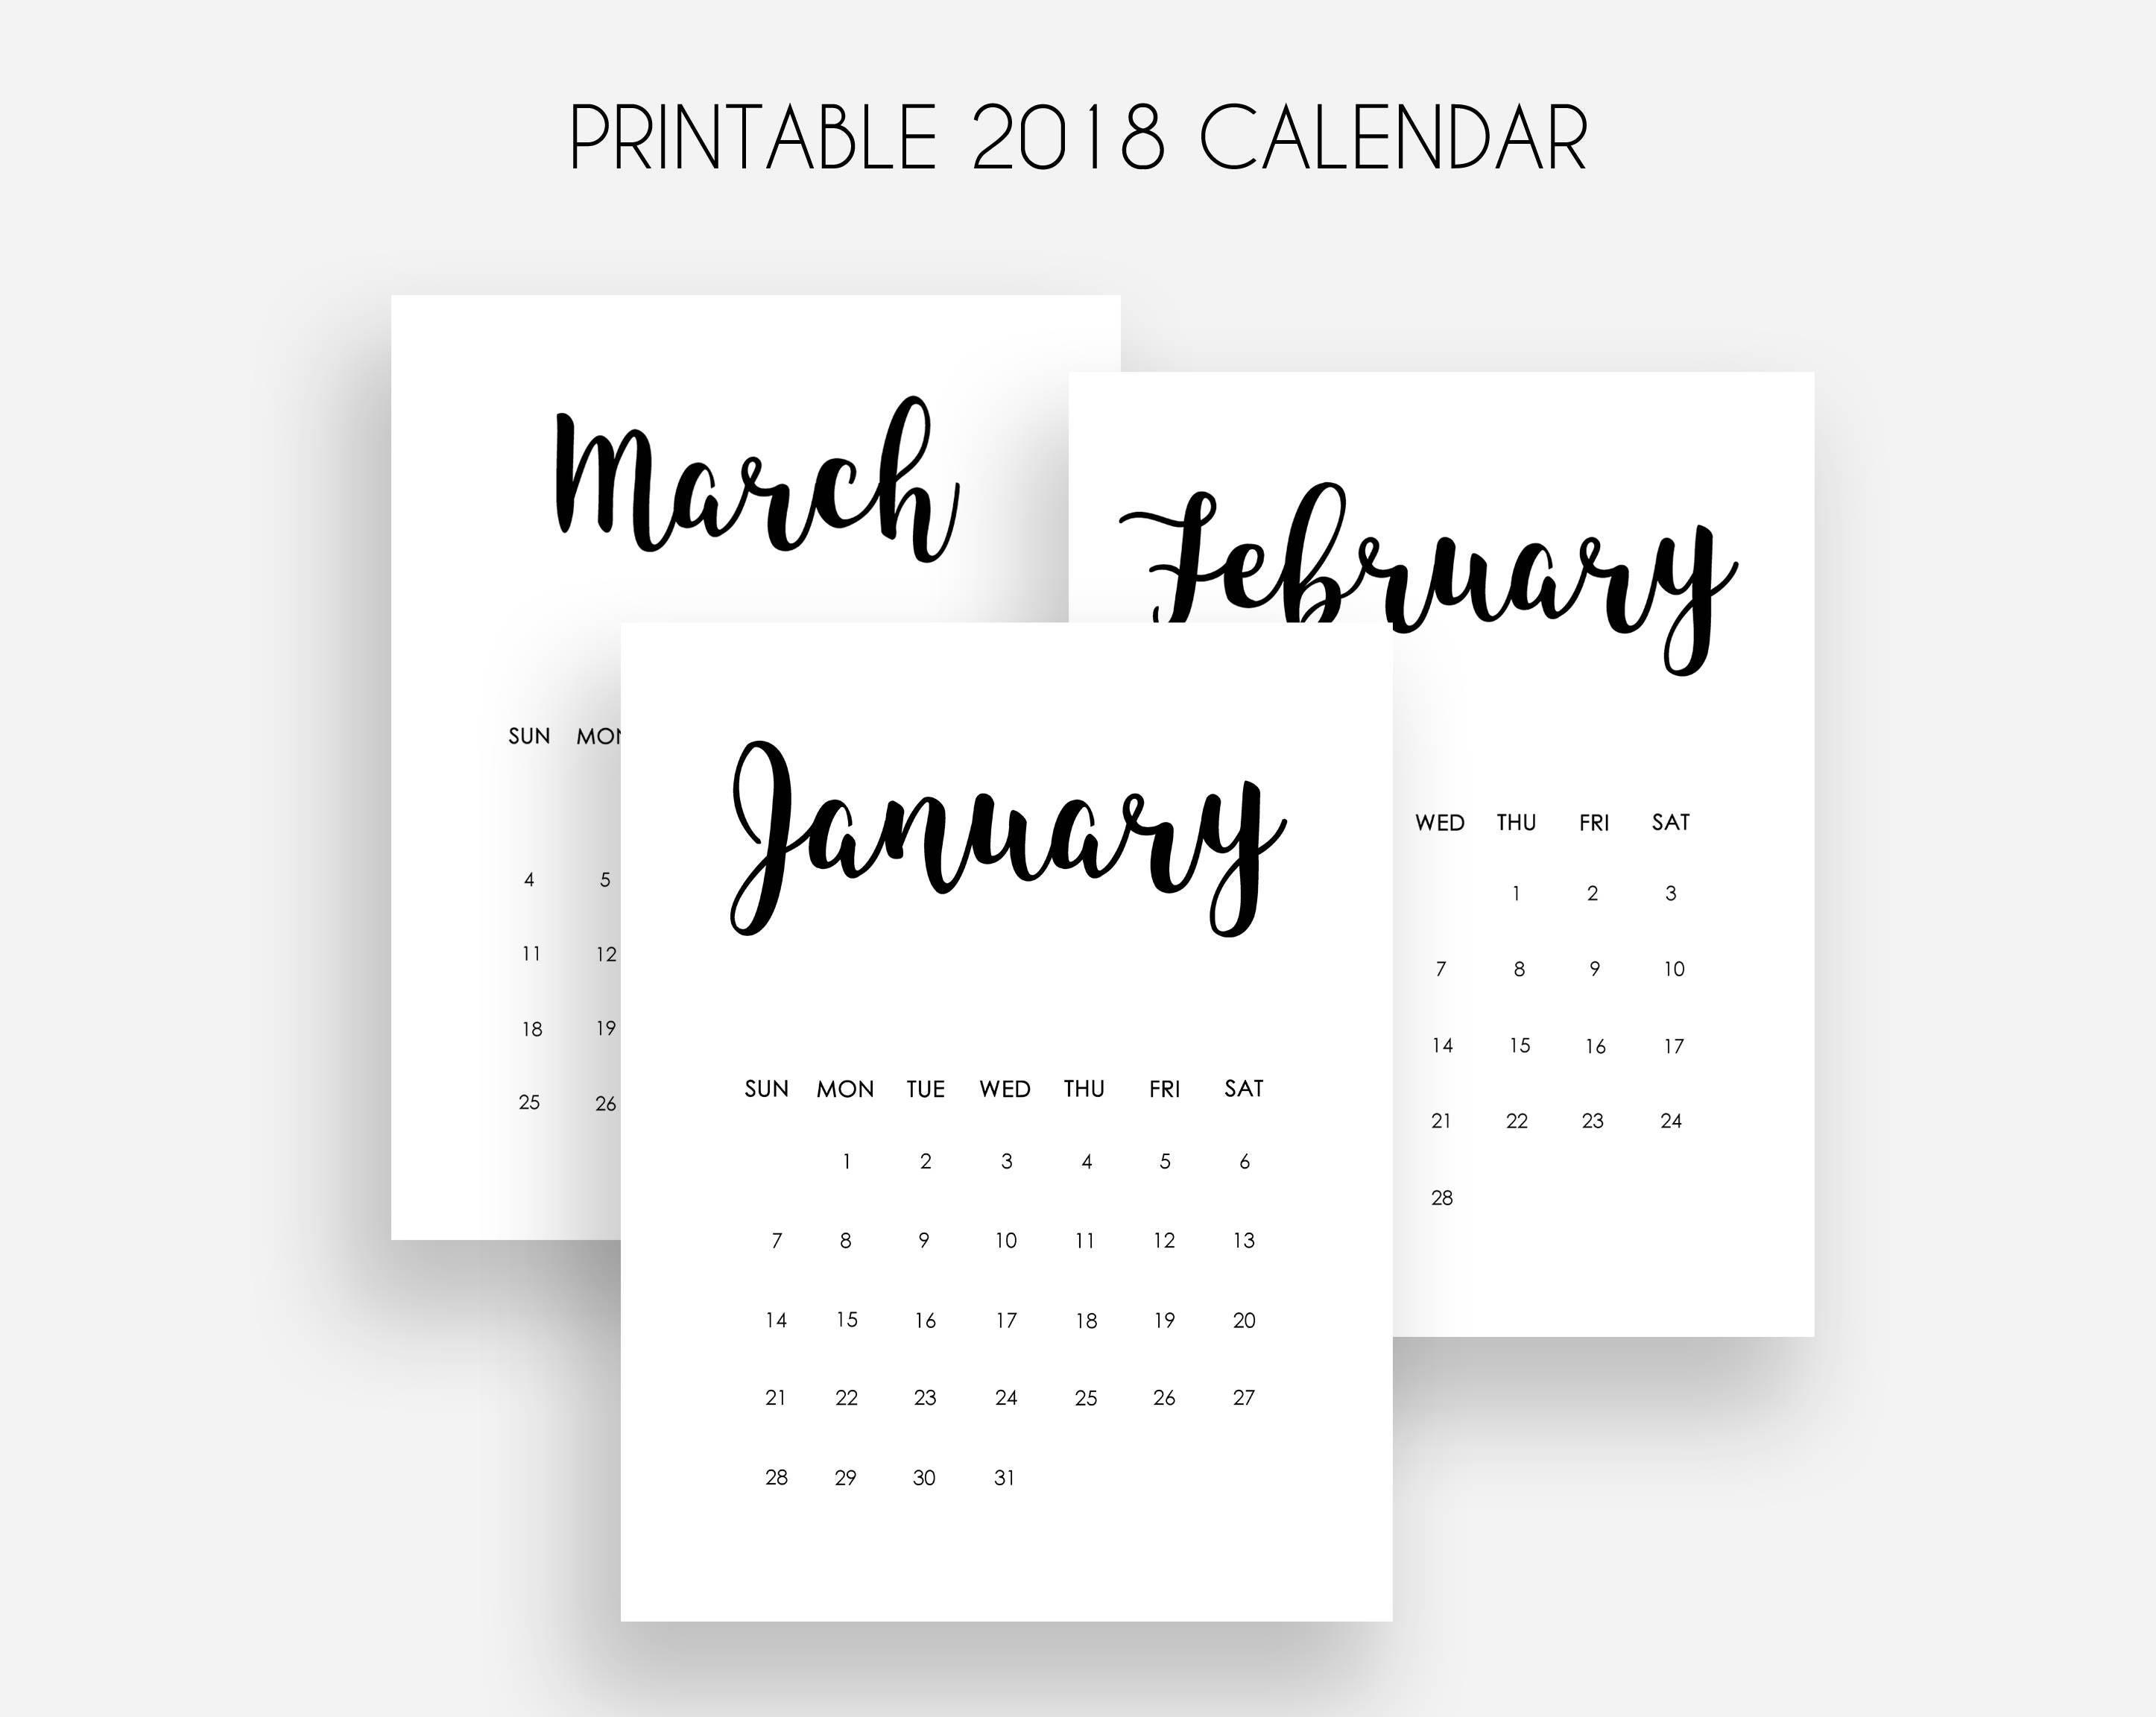 2018 Calendar Minimalist Printable : Printable kalender monats